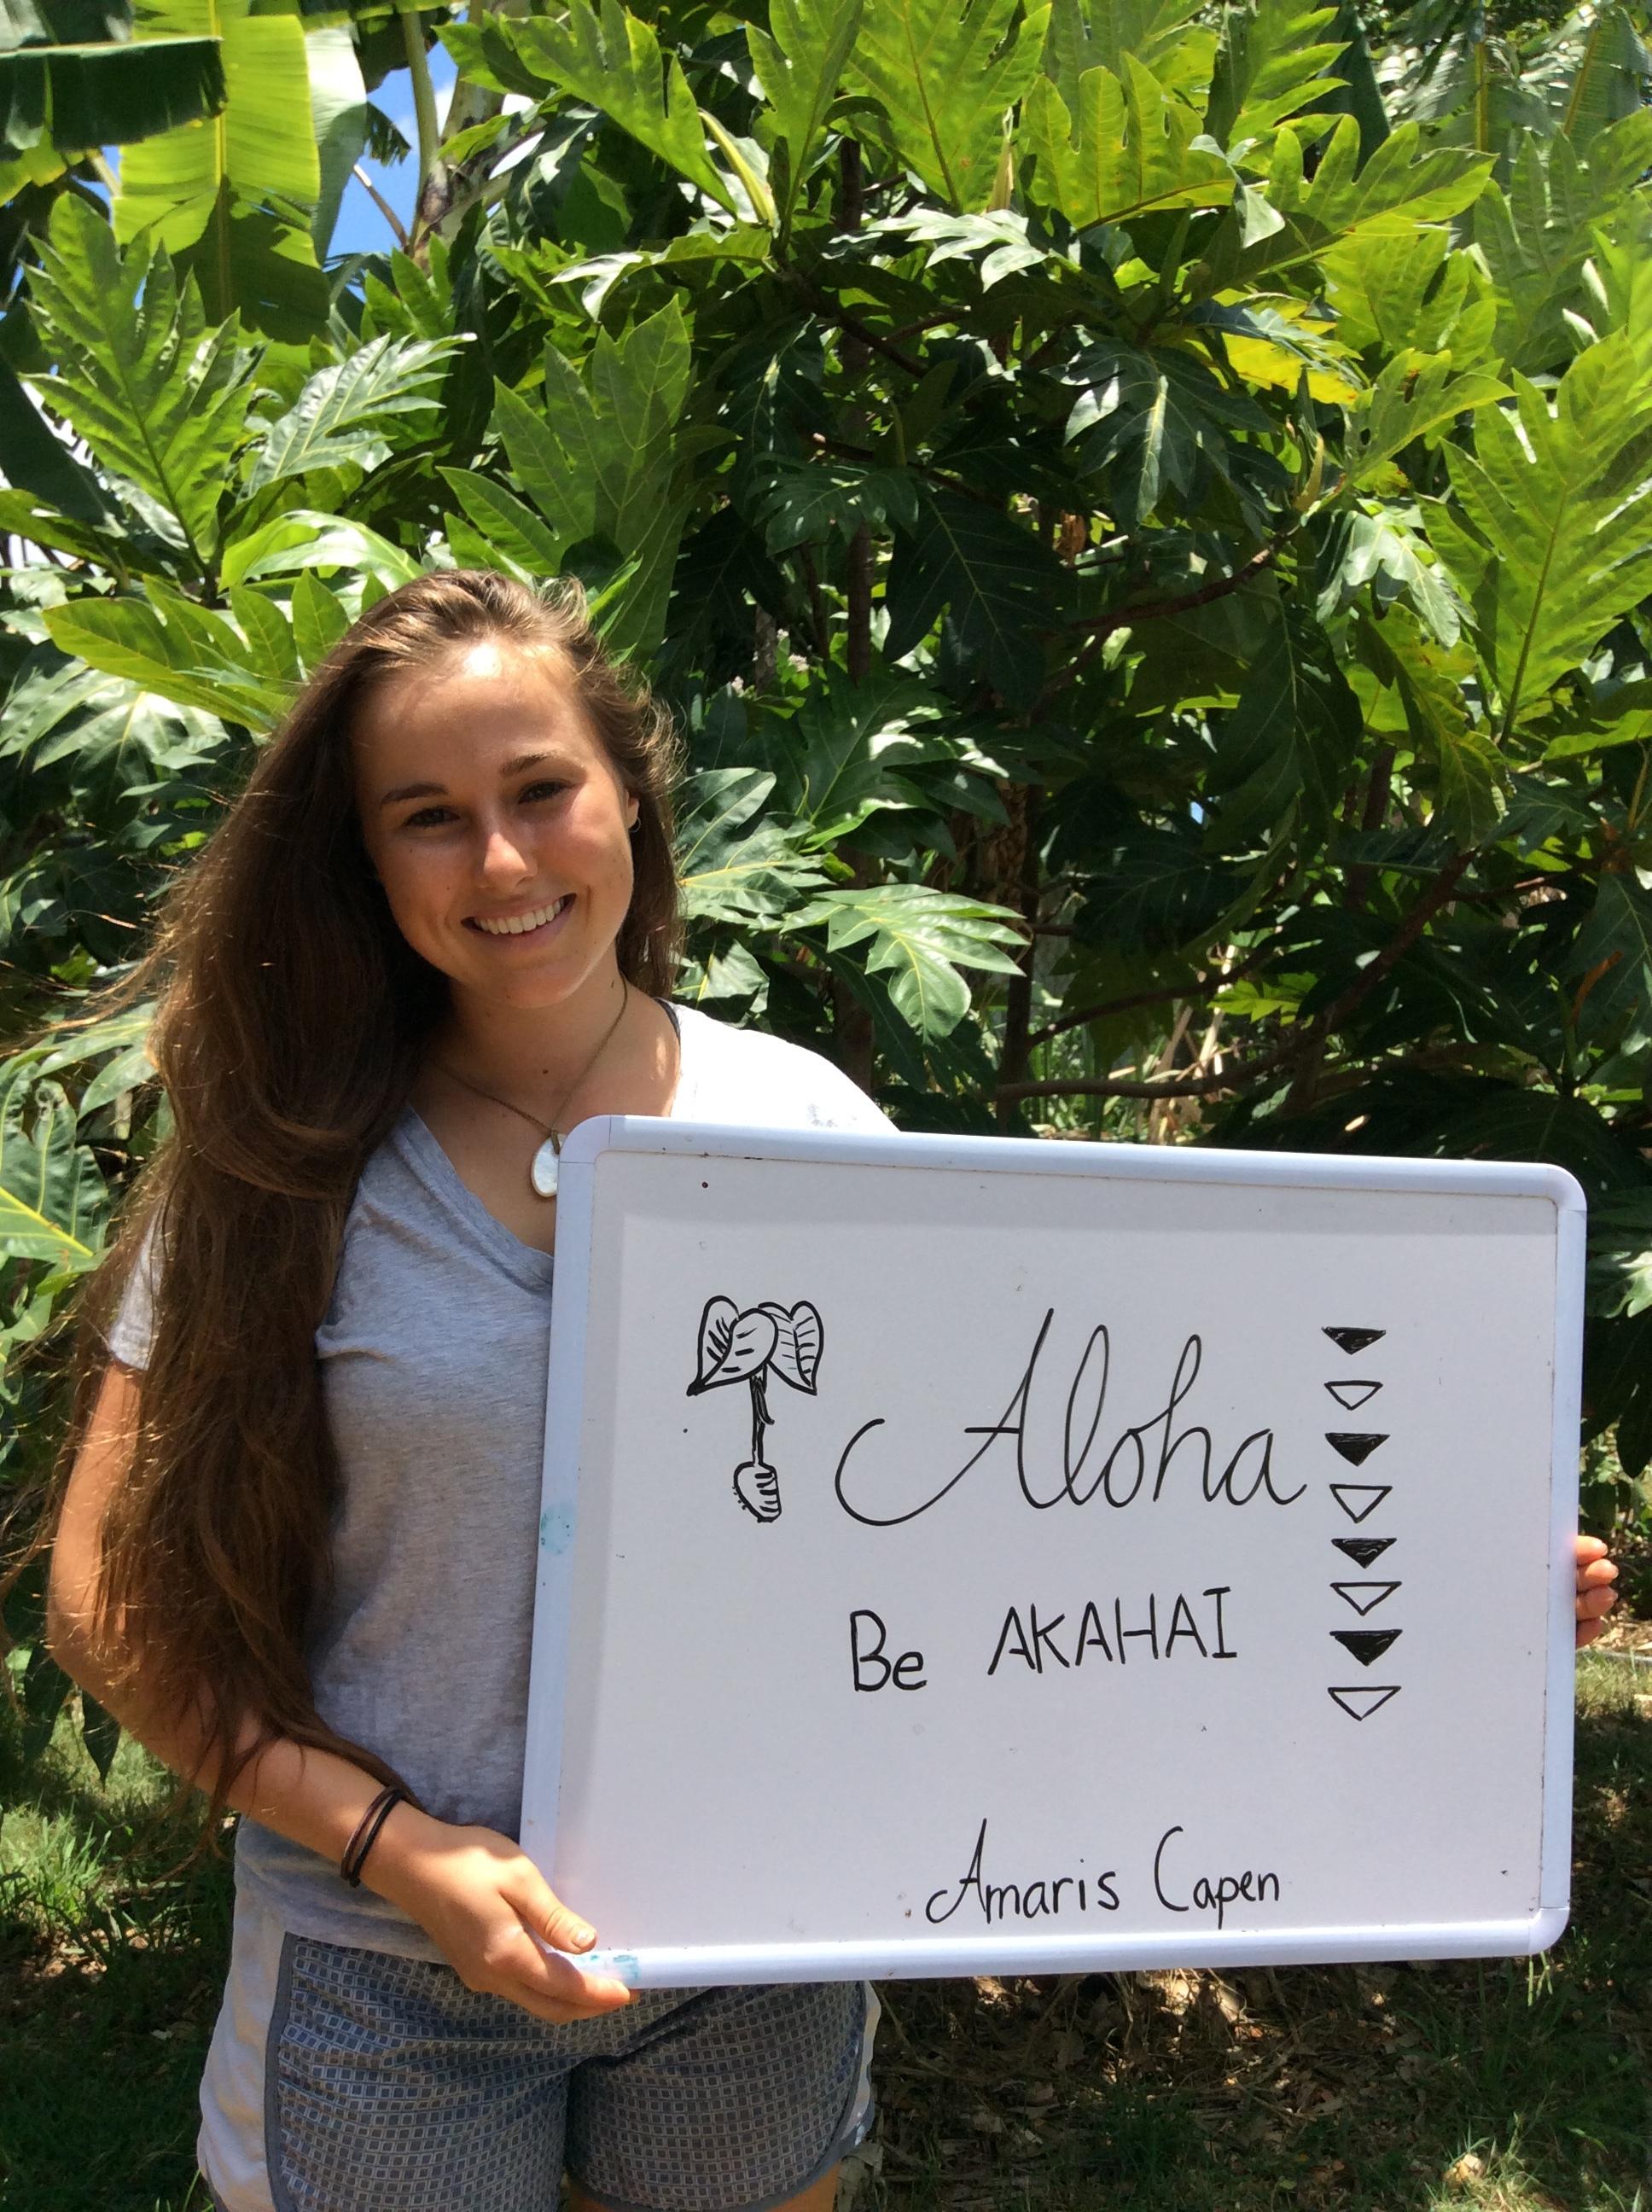 Amaris Capen  (May - July 2017)